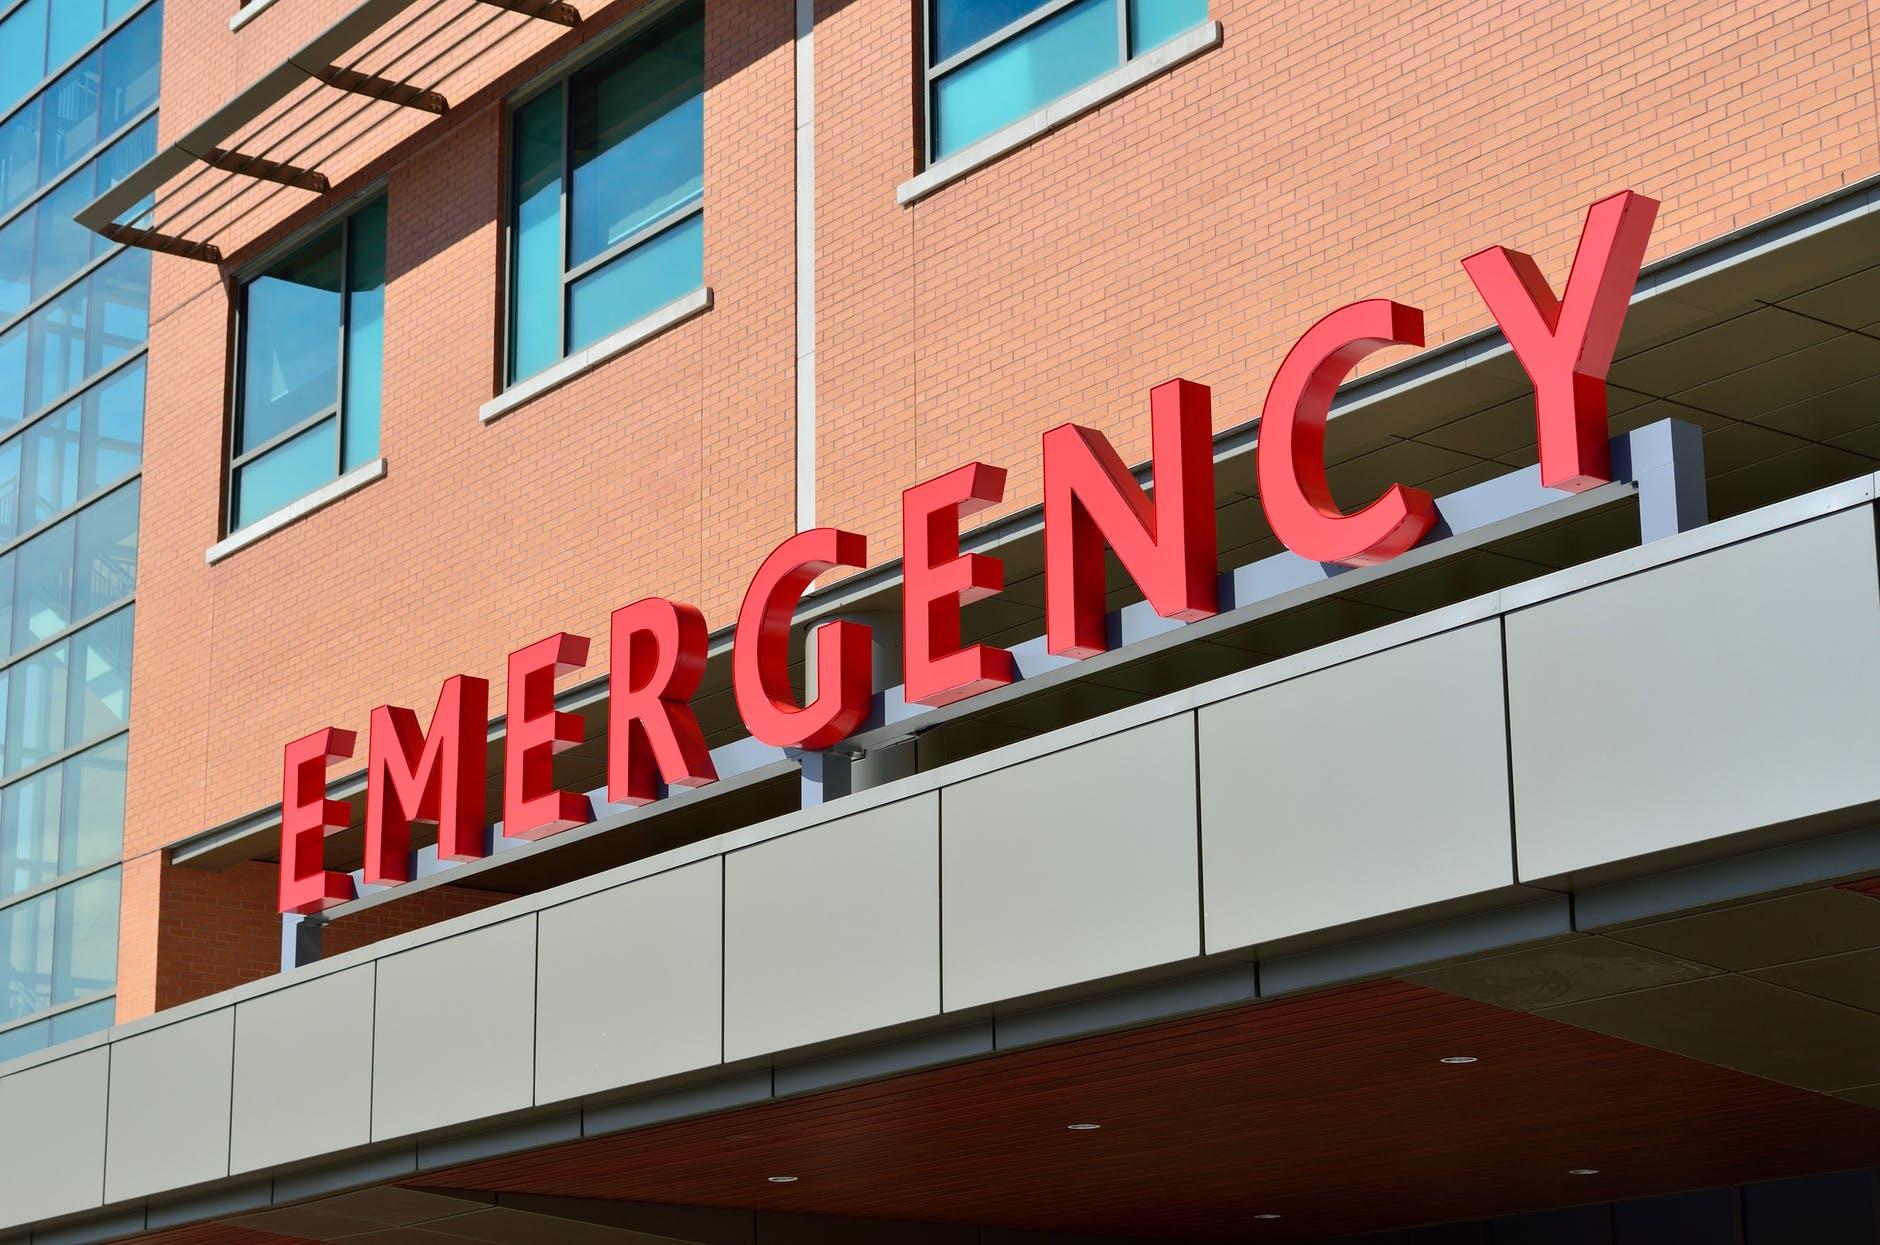 ambulance architecture building business